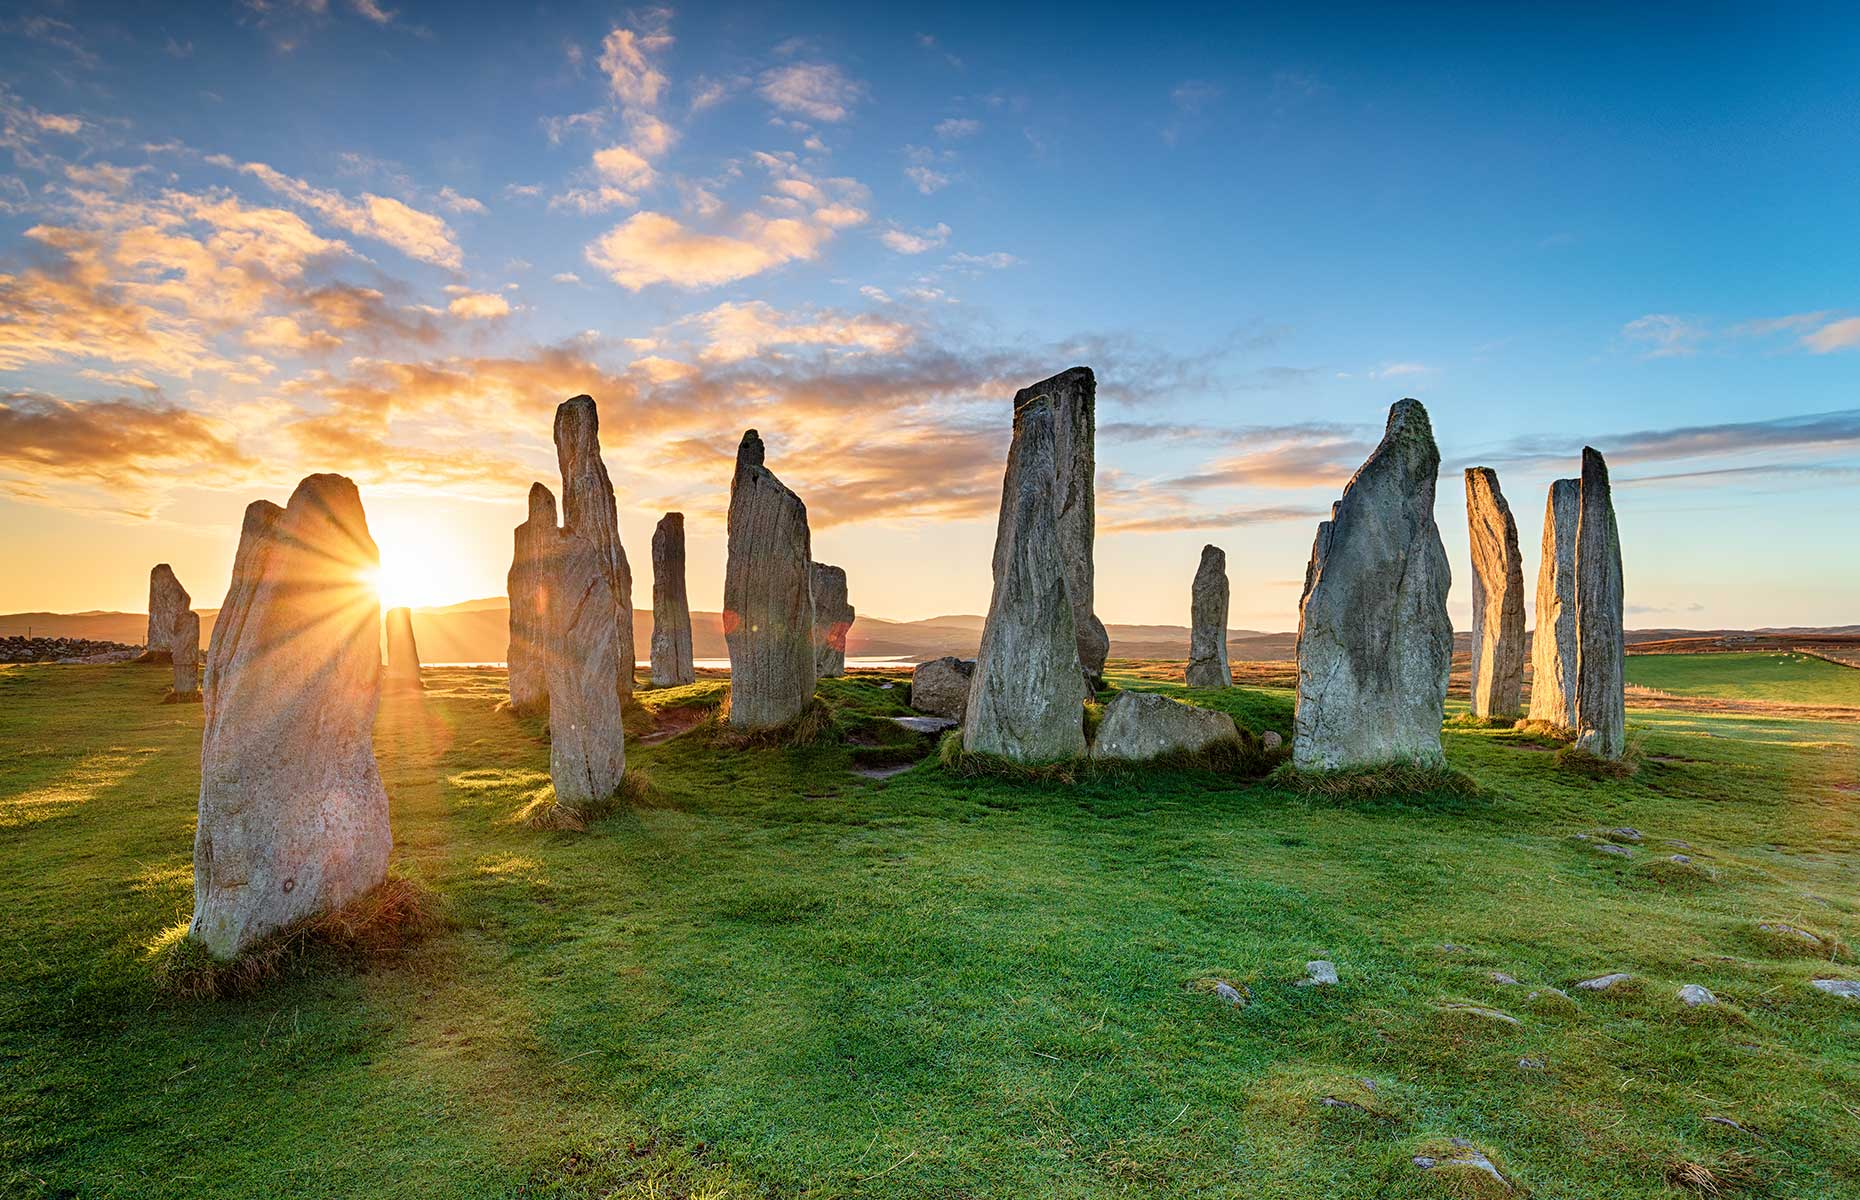 Calanais Standing Stones, Lewis, Scotland (Images: Helen Hotson/Shutterstock)